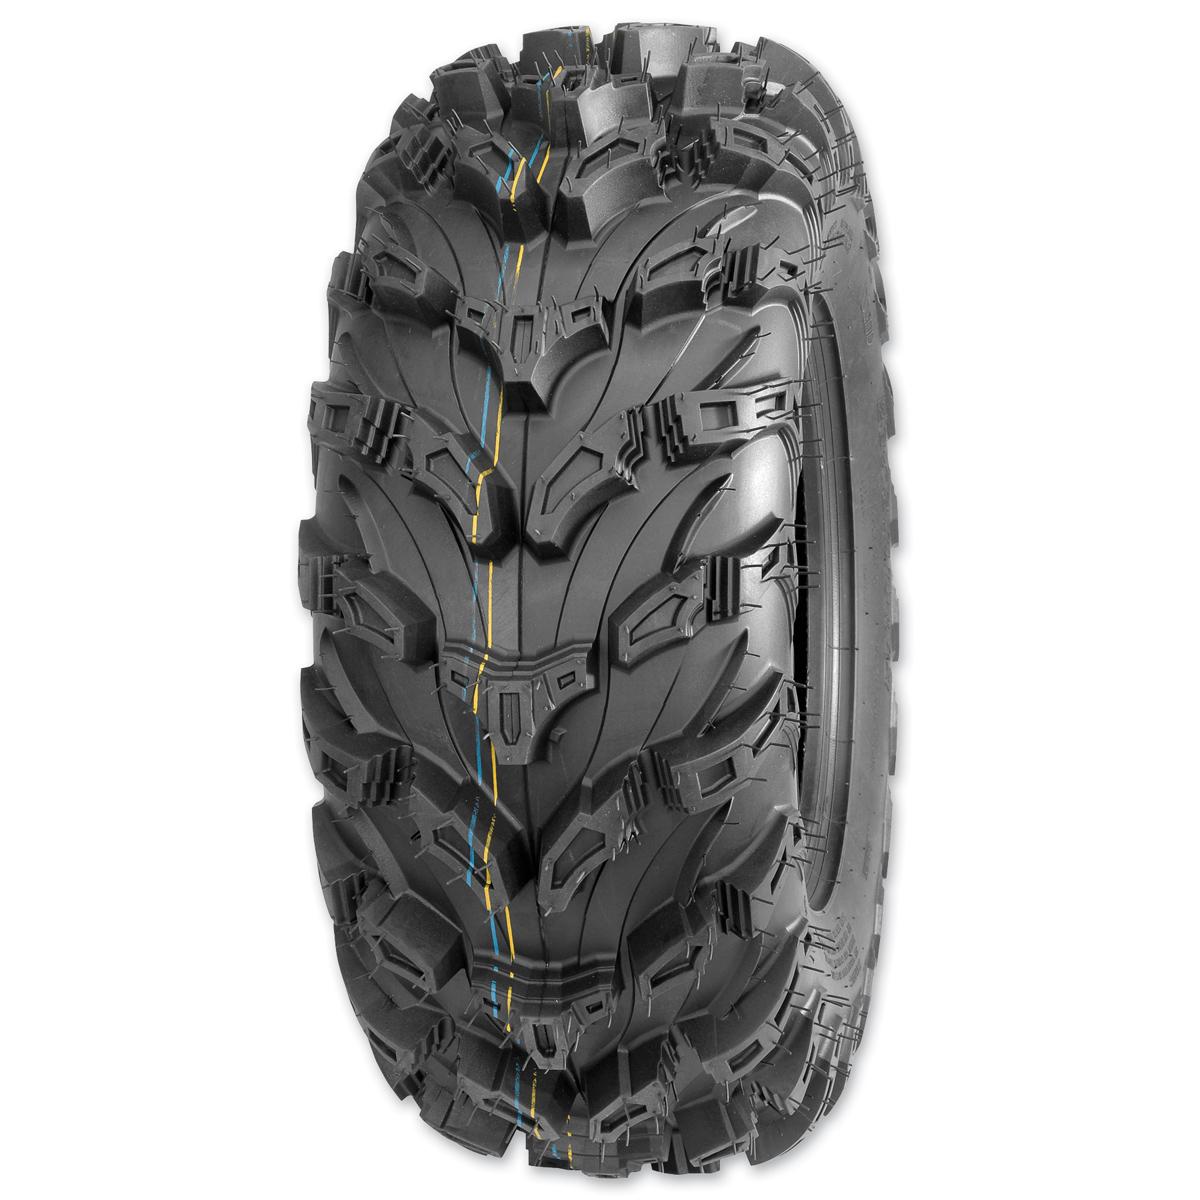 Quadboss QBT672 26X9R12 8-Ply Front Tire